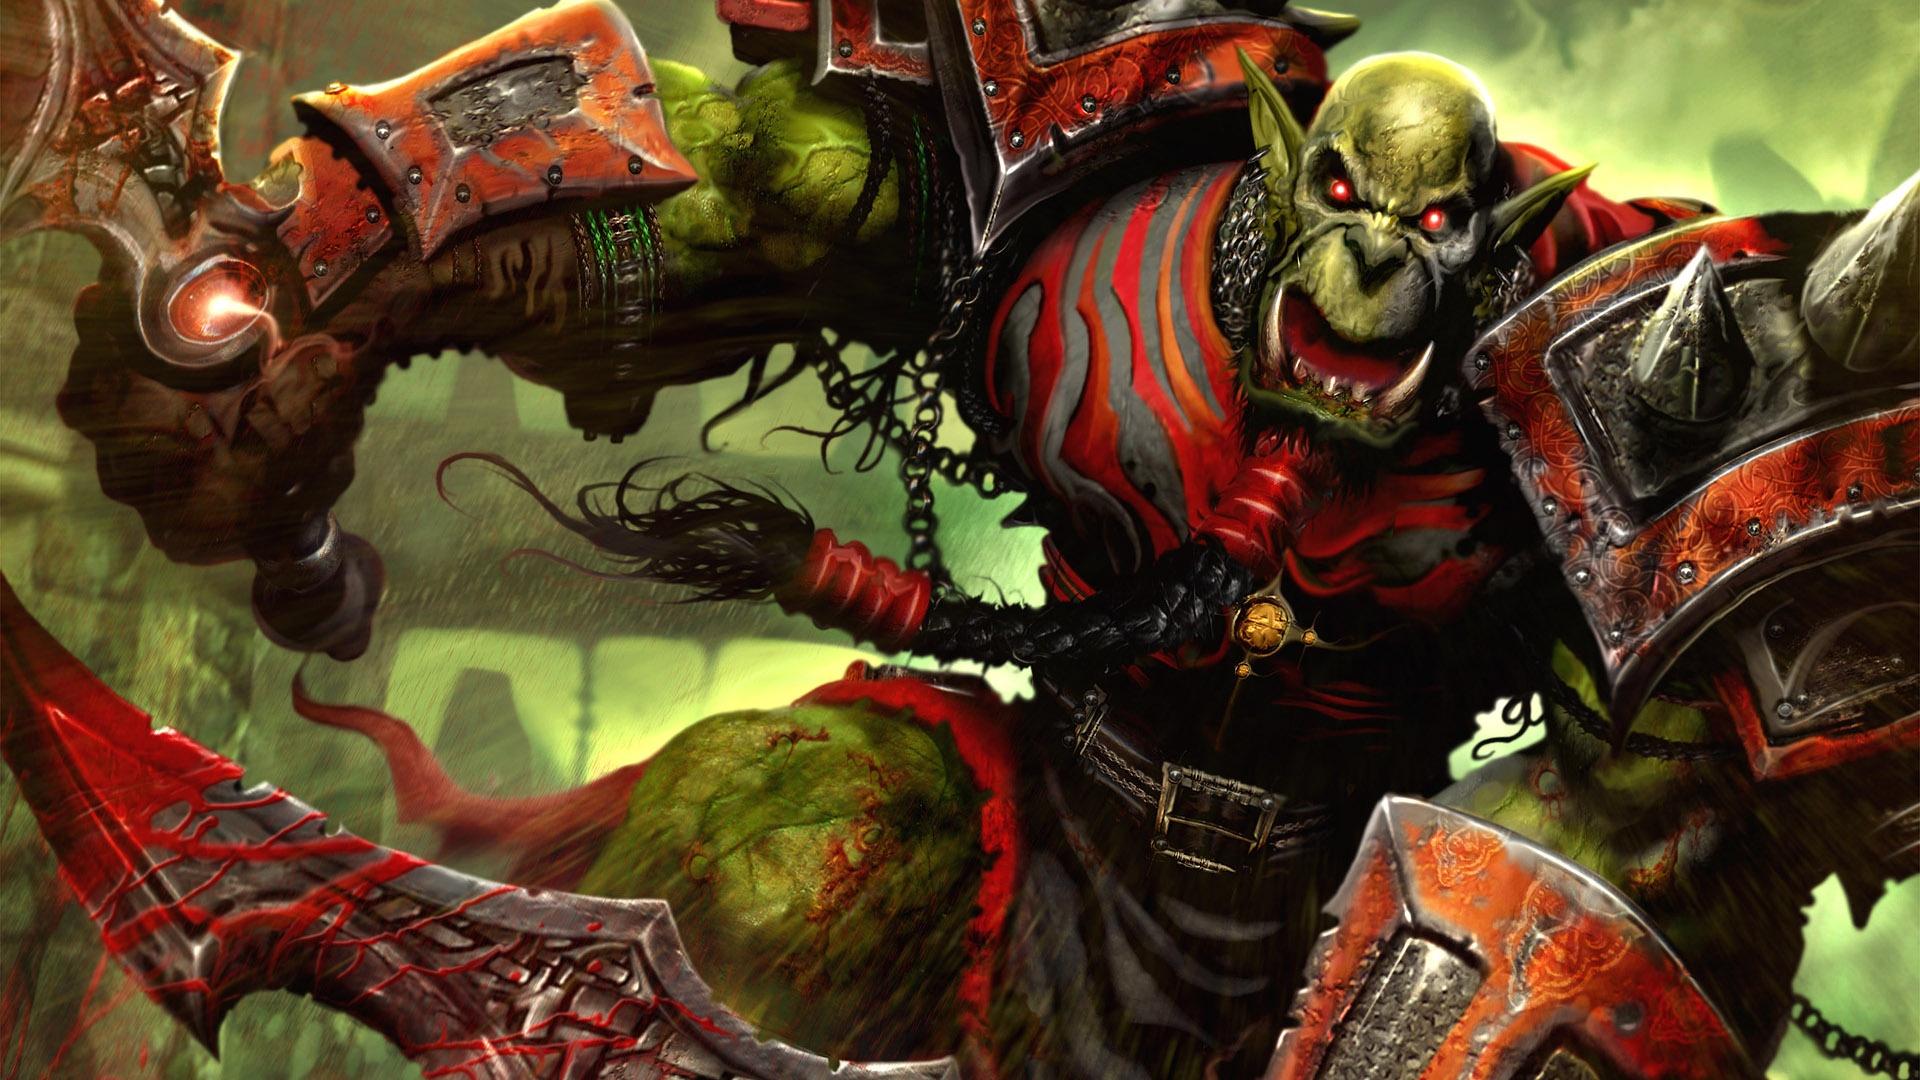 warcraft orc horde - photo #9